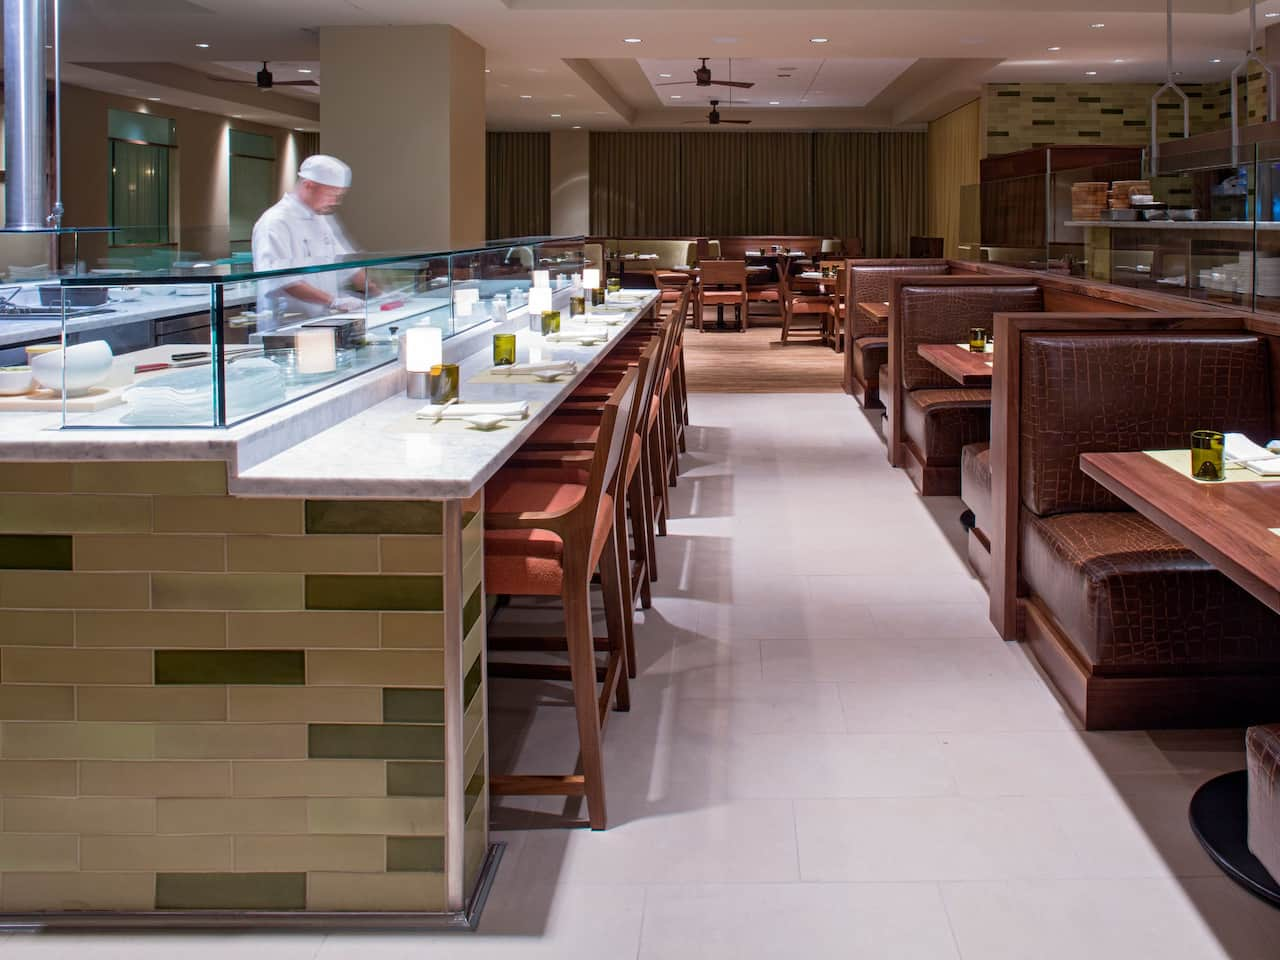 Sushi bar at McCoy's Bar and Grill near the Orlando Airport